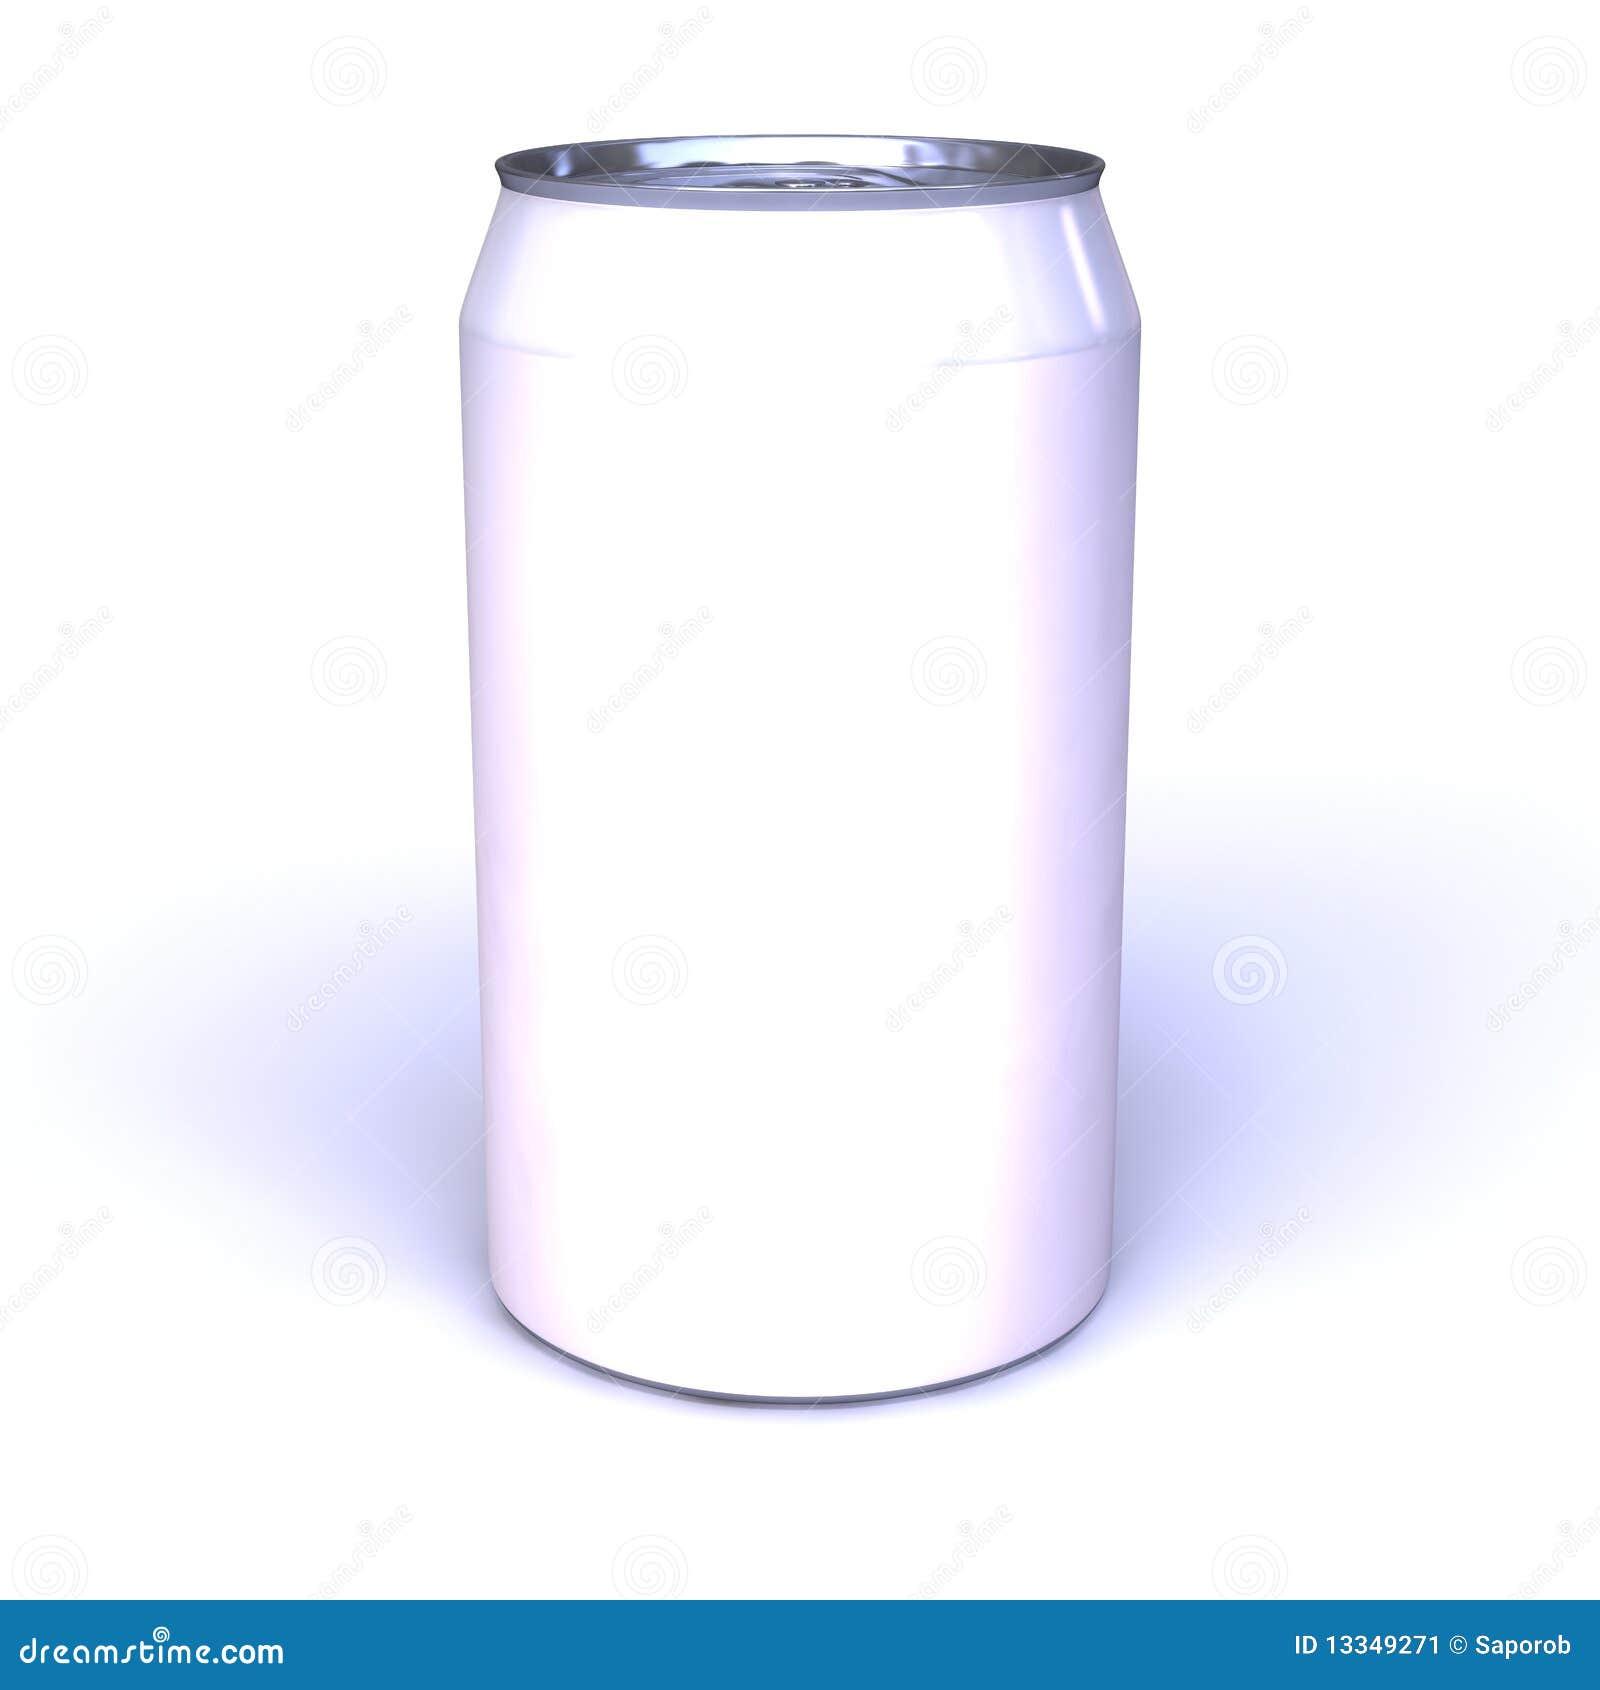 blank blue soda can - photo #26